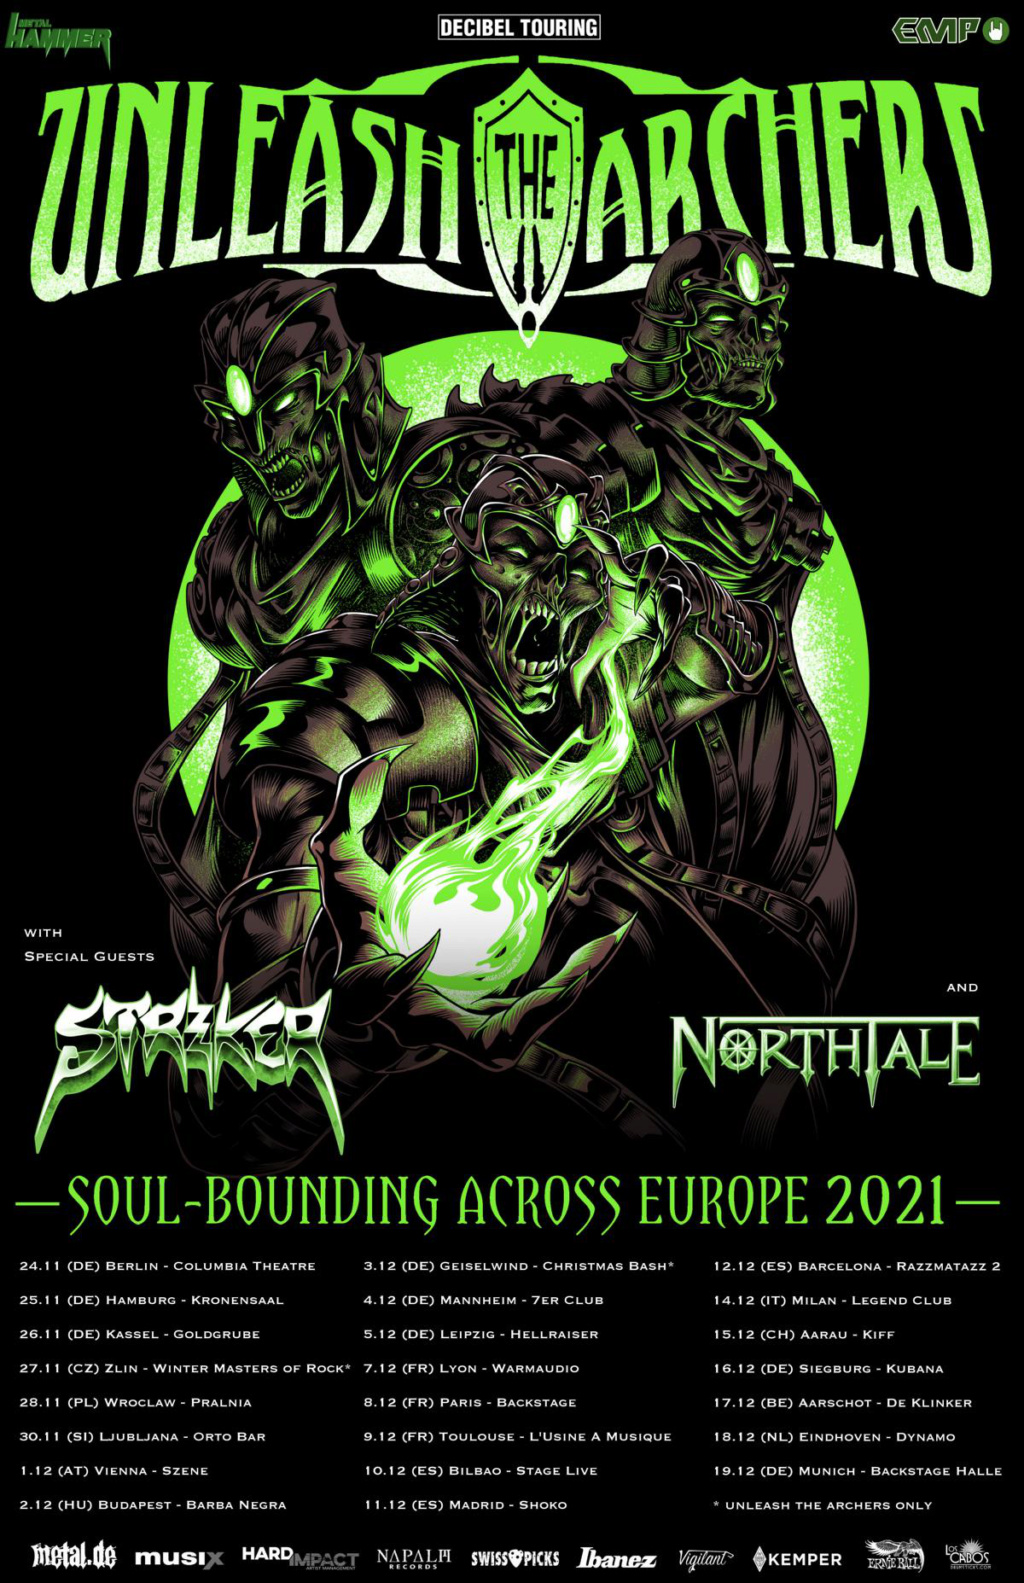 UNLEASH THE ARCHERS announce Soul-Bounding Across Europe 2021 tour! Aab11